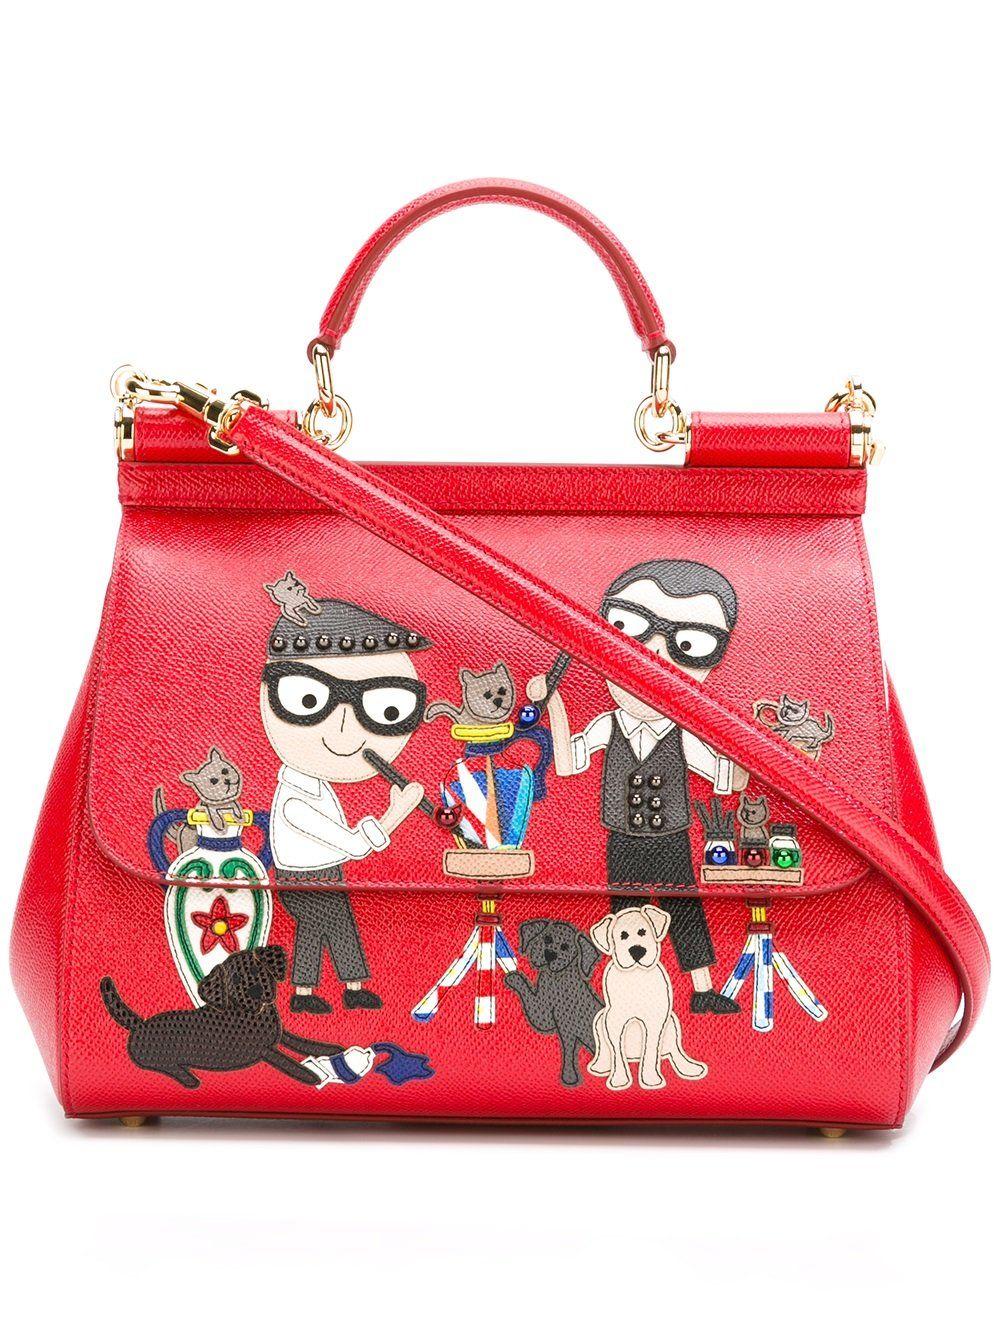 DG Family Sicily tote - Red Dolce & Gabbana SJW9R